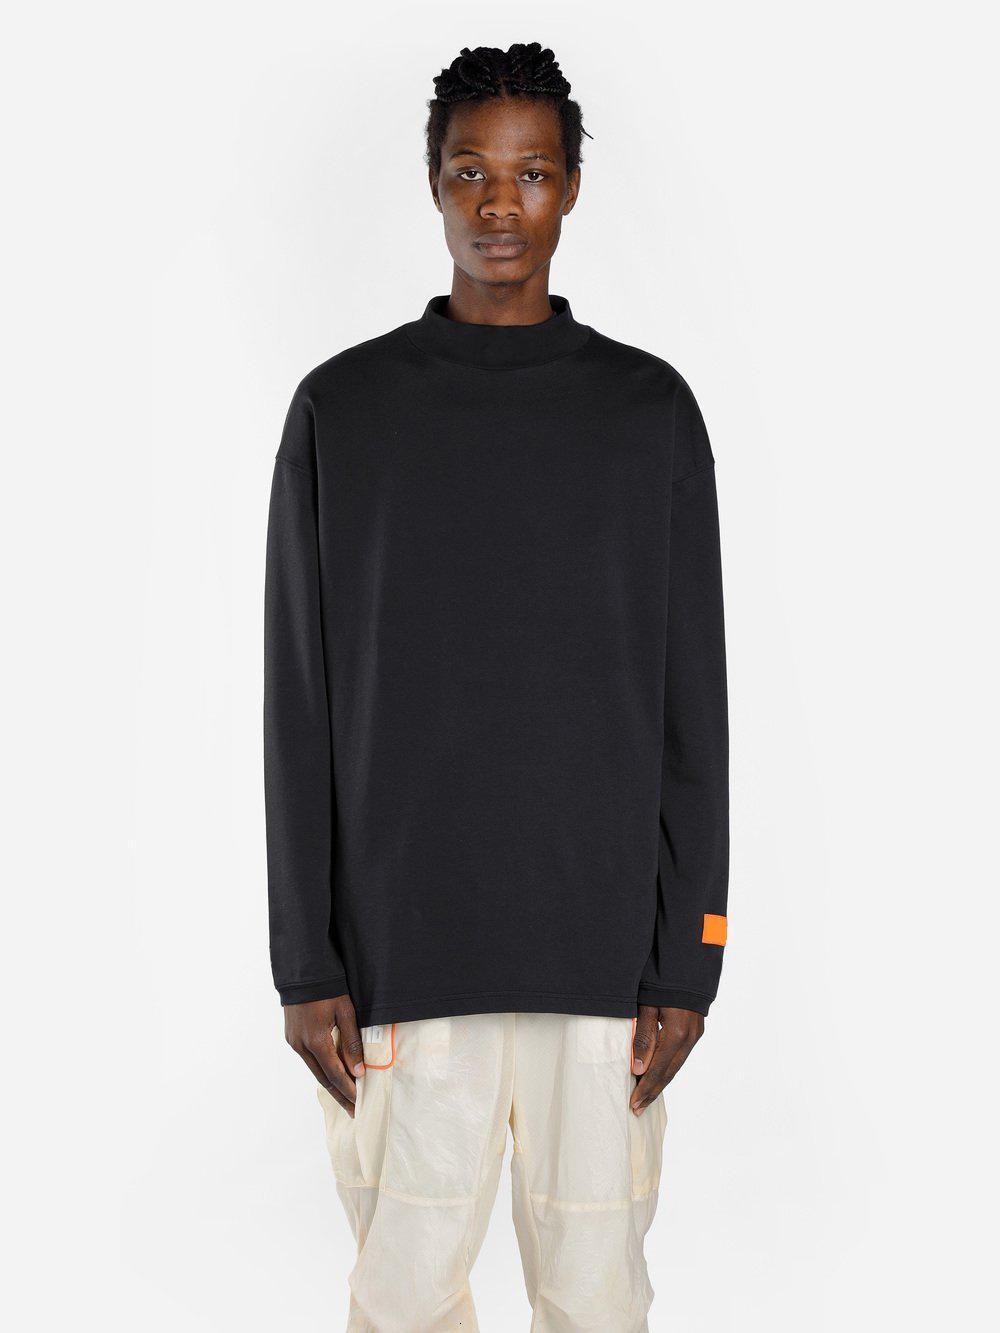 2020 new designers t shirts mens tees hip hop brand street long shirt 3D letter printing cotton crew neck short sleeve long sleeve shirts